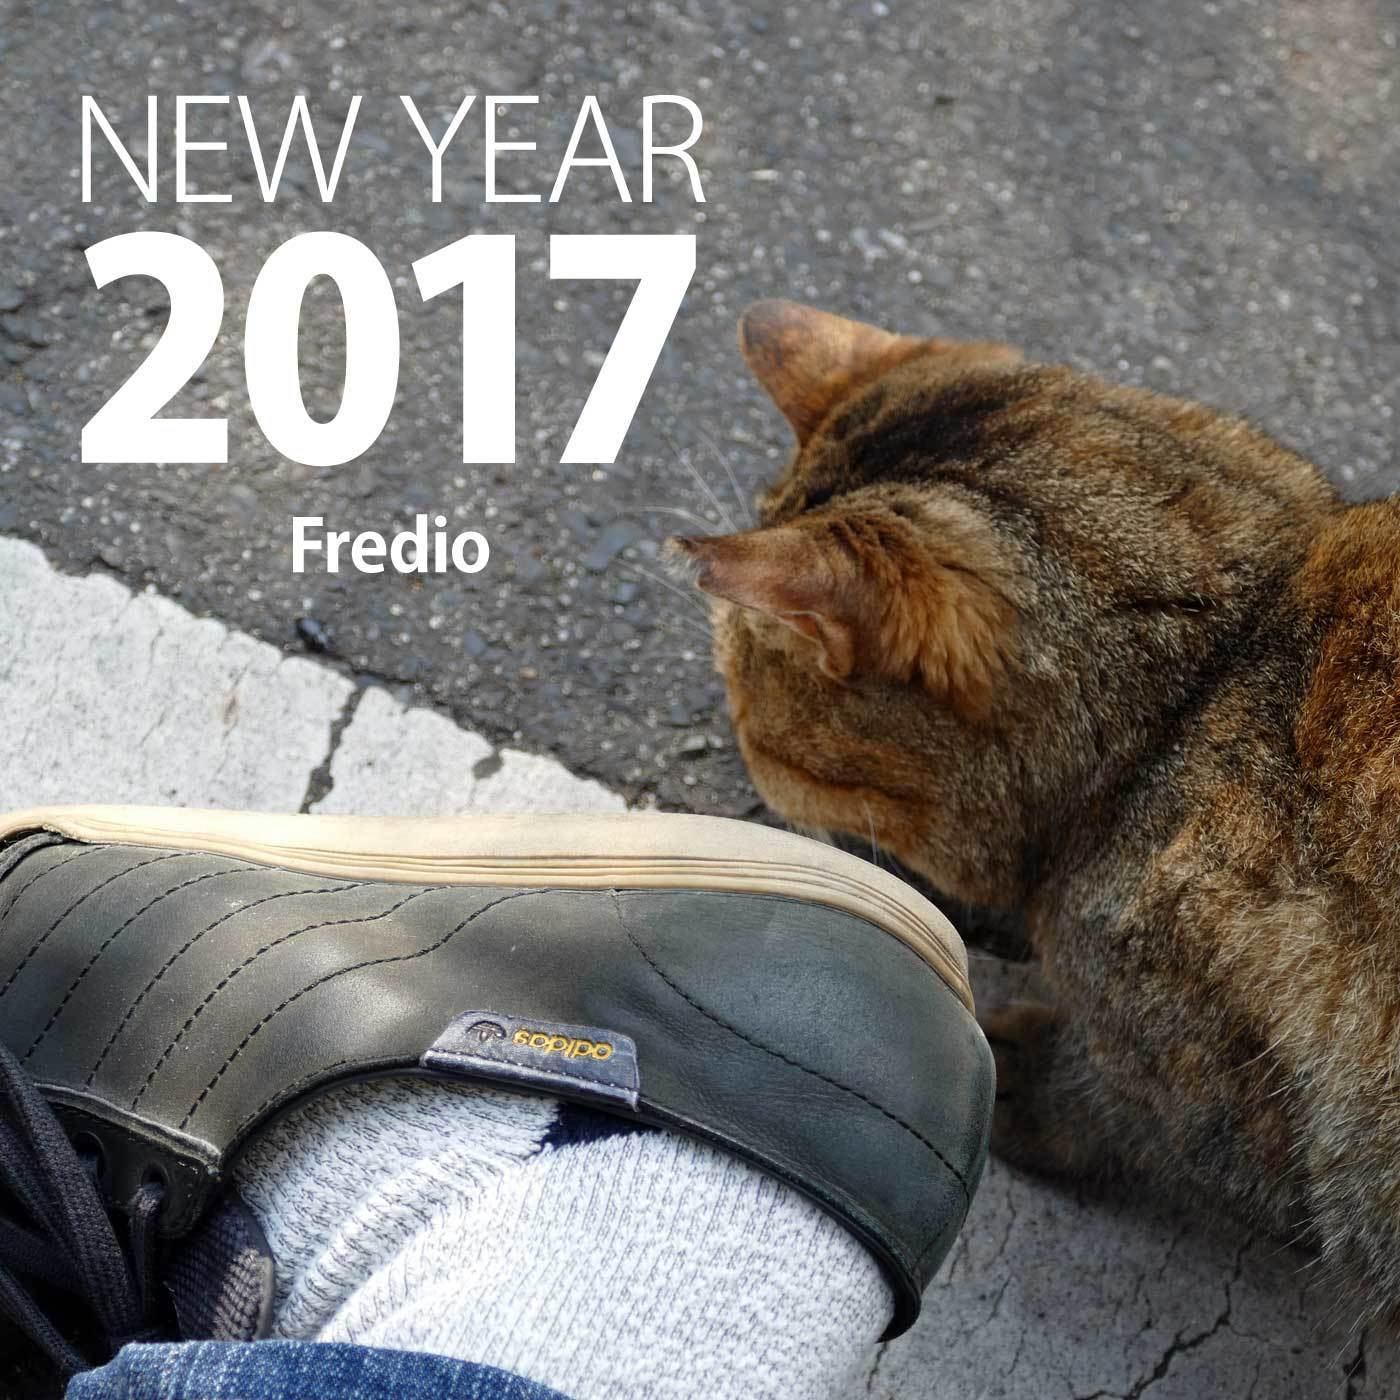 new_year2017.jpg